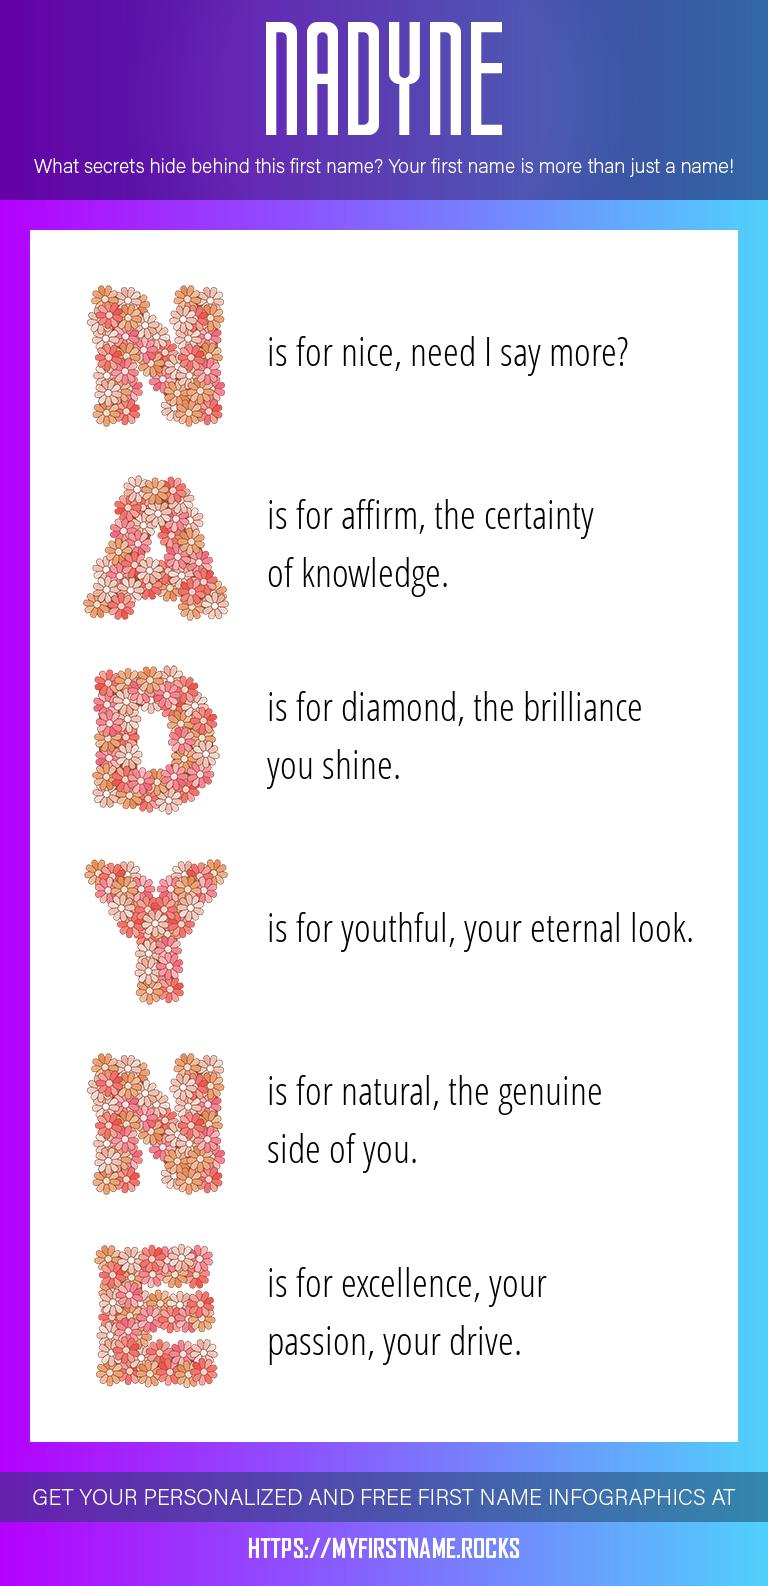 Nadyne Infographics